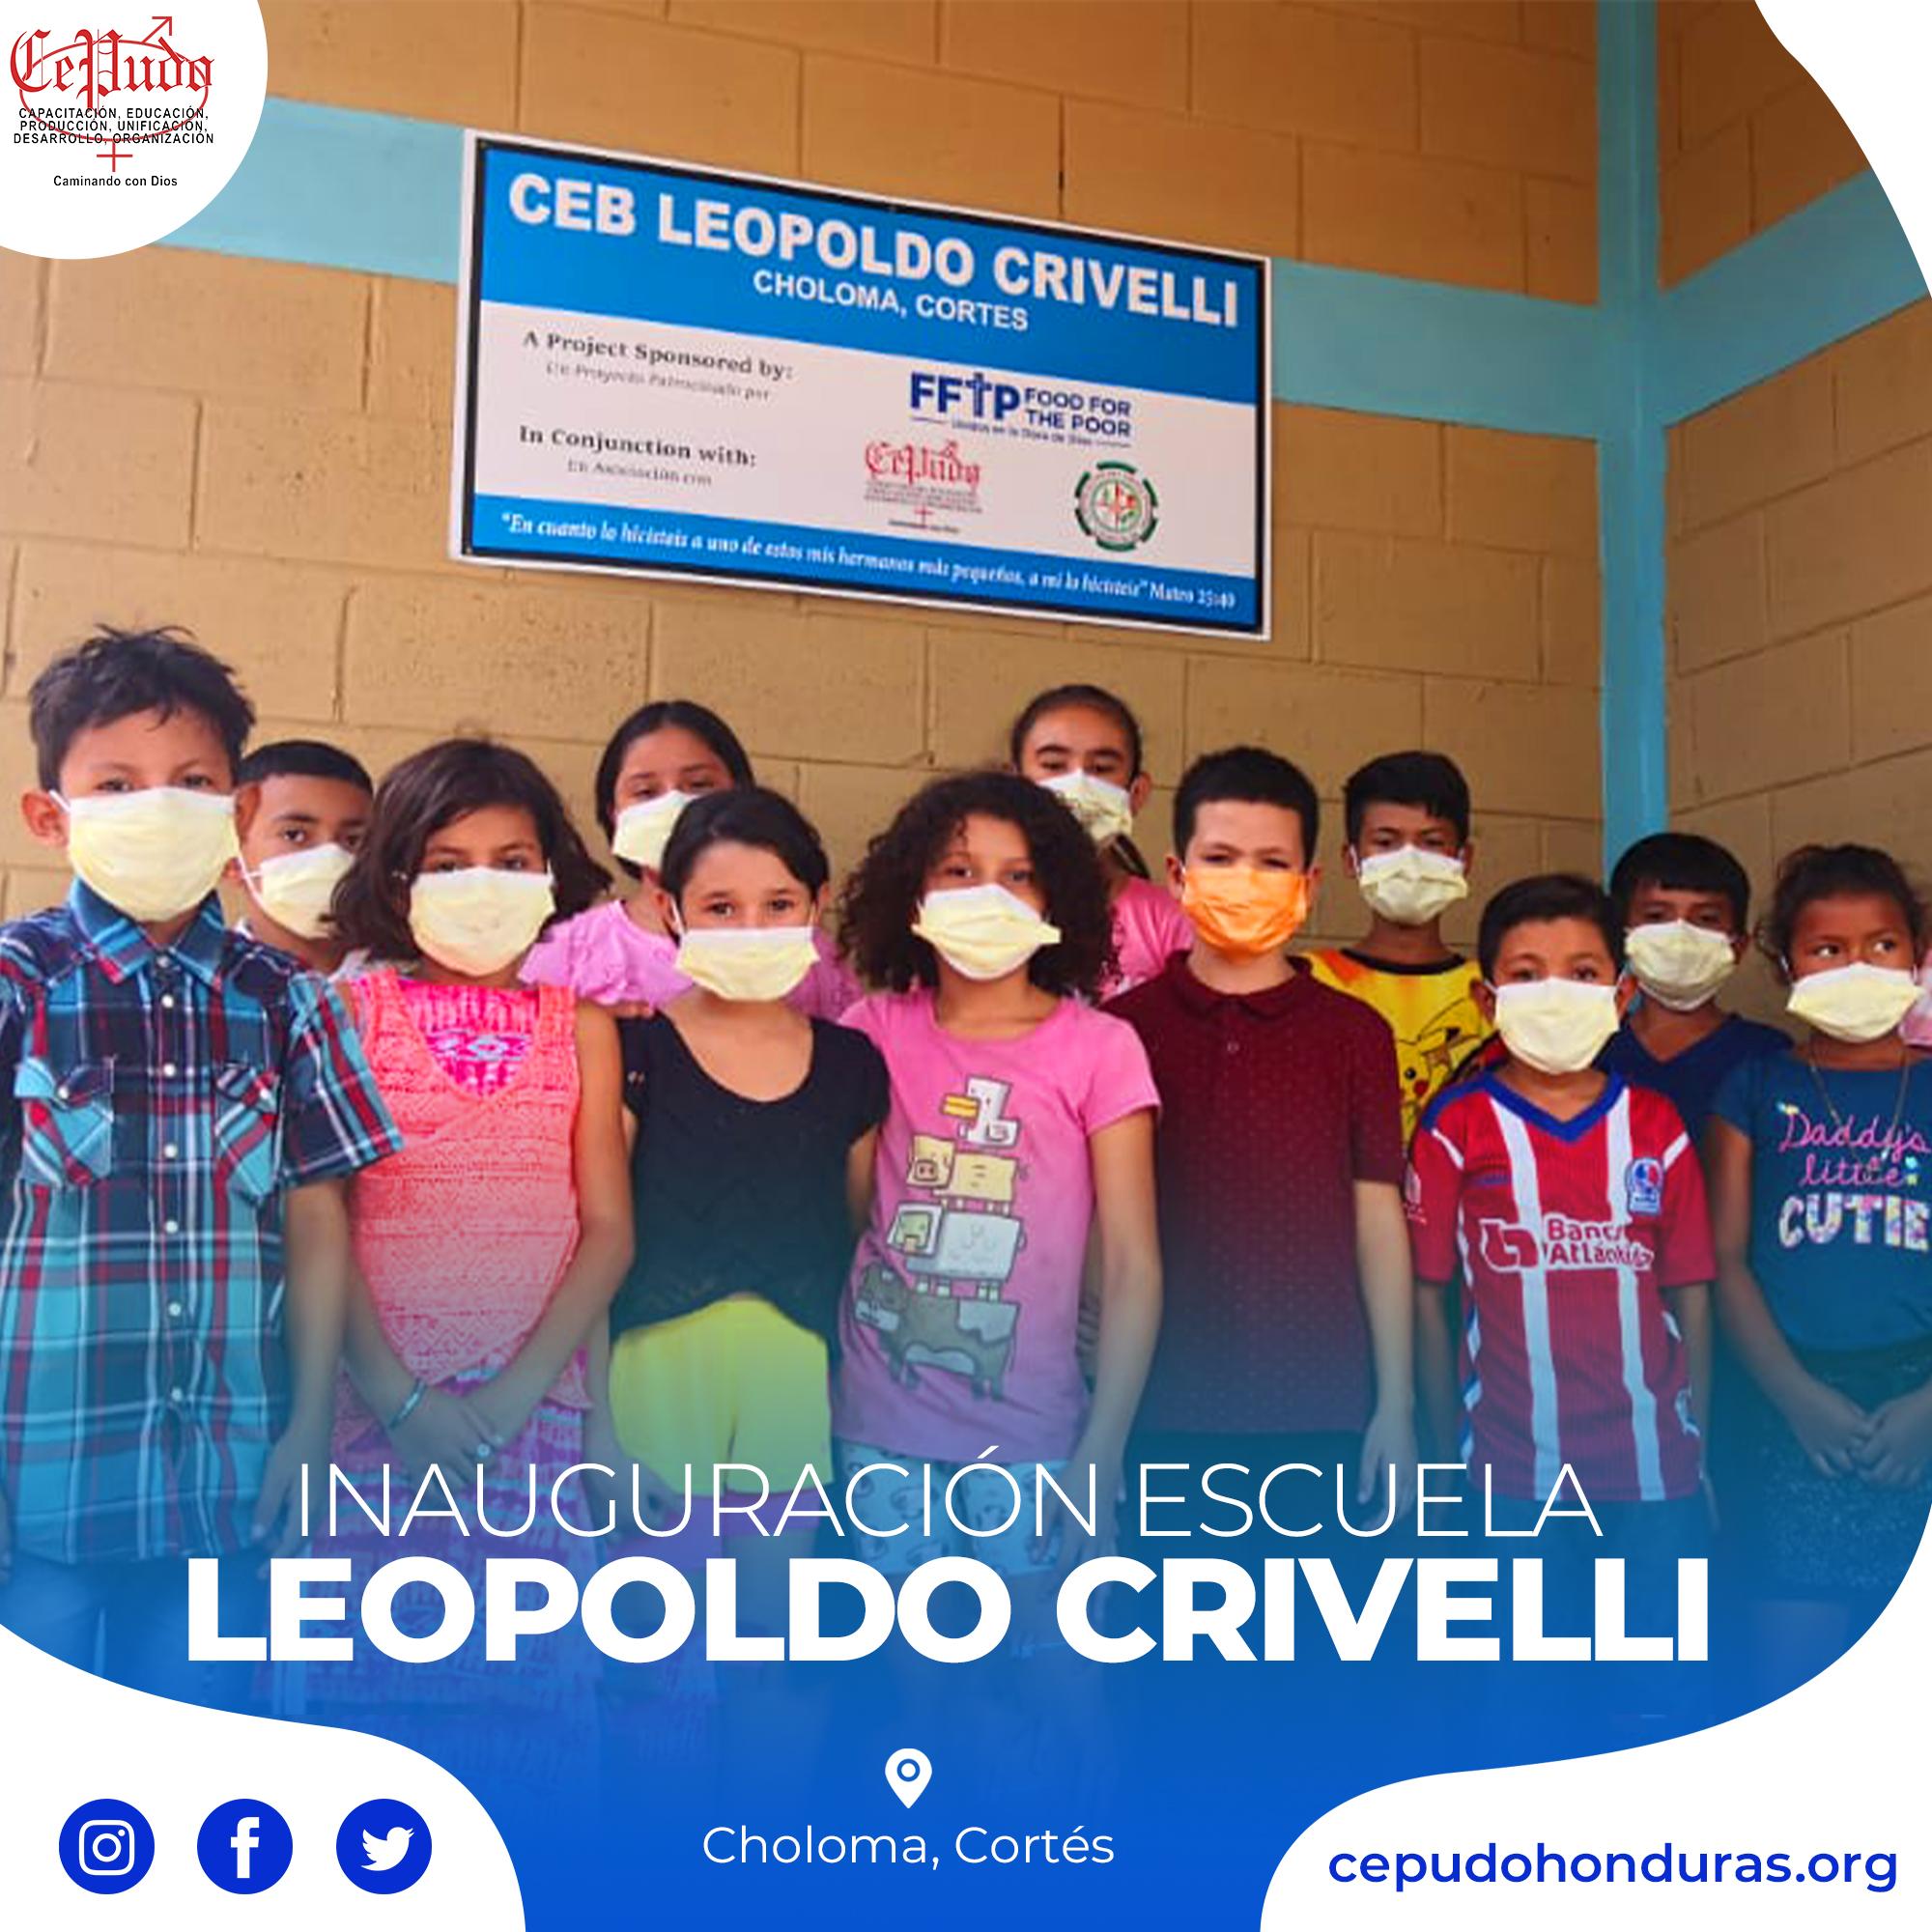 Inauguration of the Leopoldo Crivelli School (Choloma, Cortés)